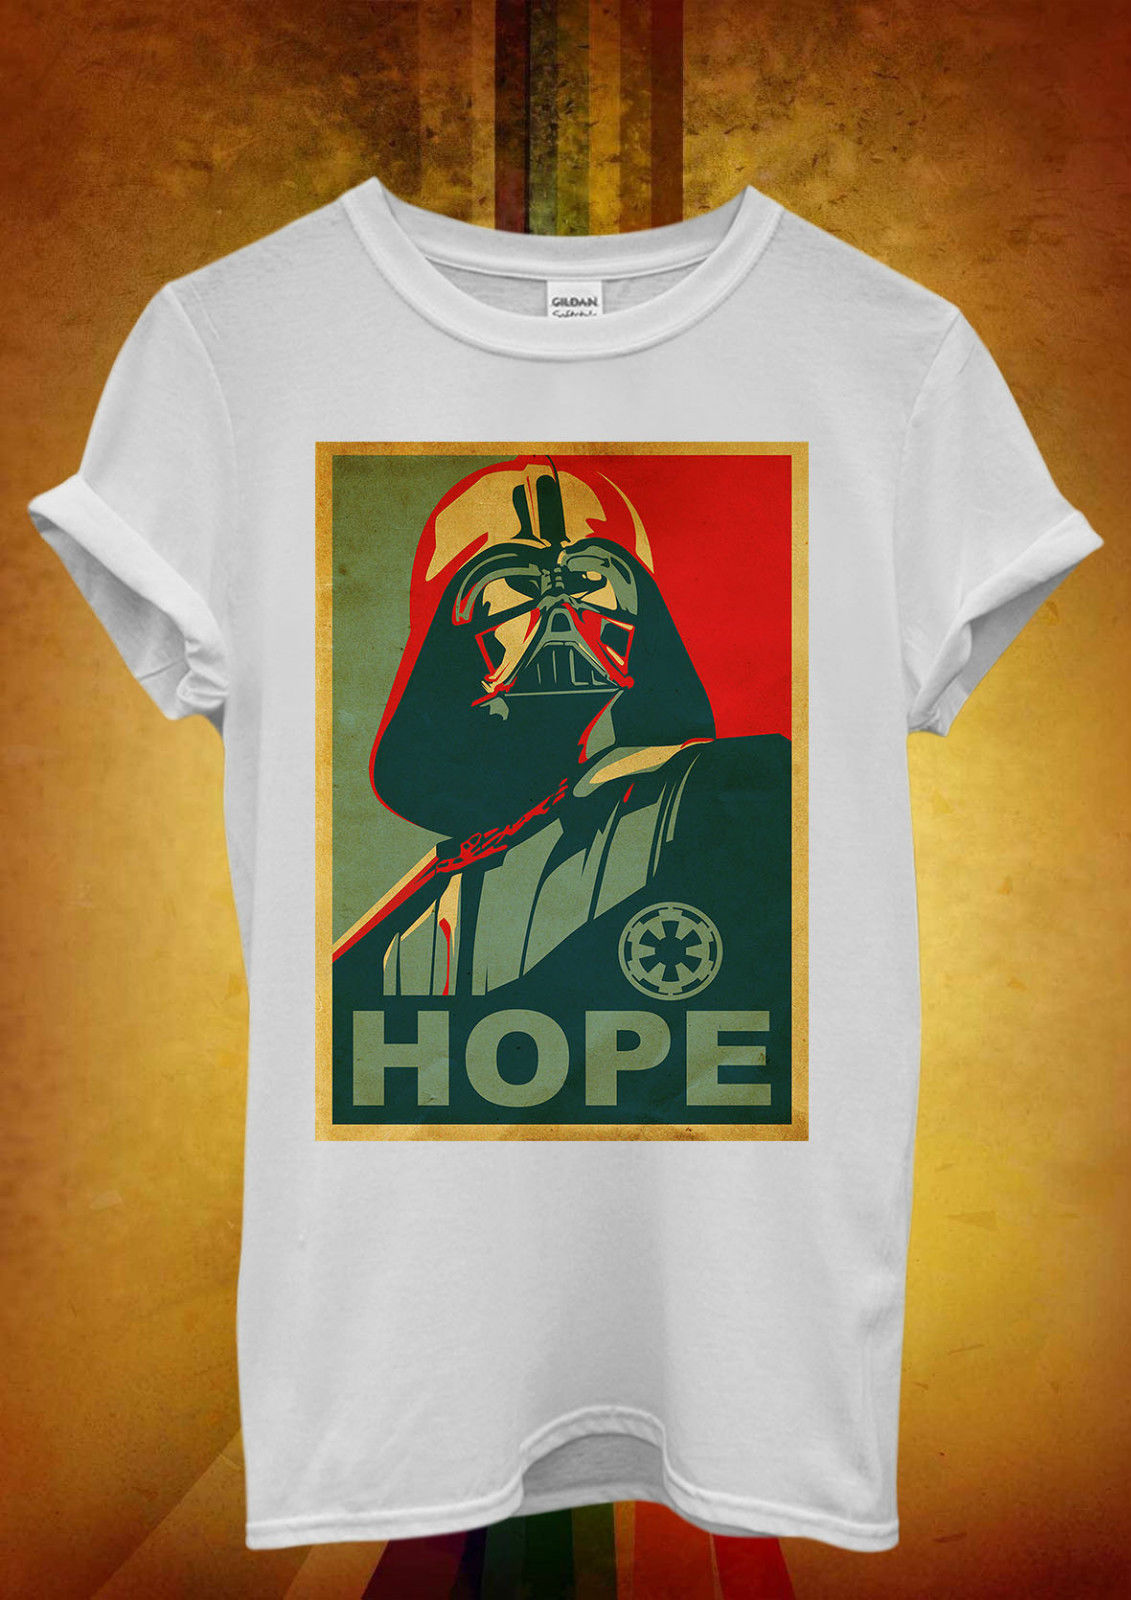 Star Wars Chewbacca Funny Surfing T-shirt Vest Tank Top Men Women Unisex 452